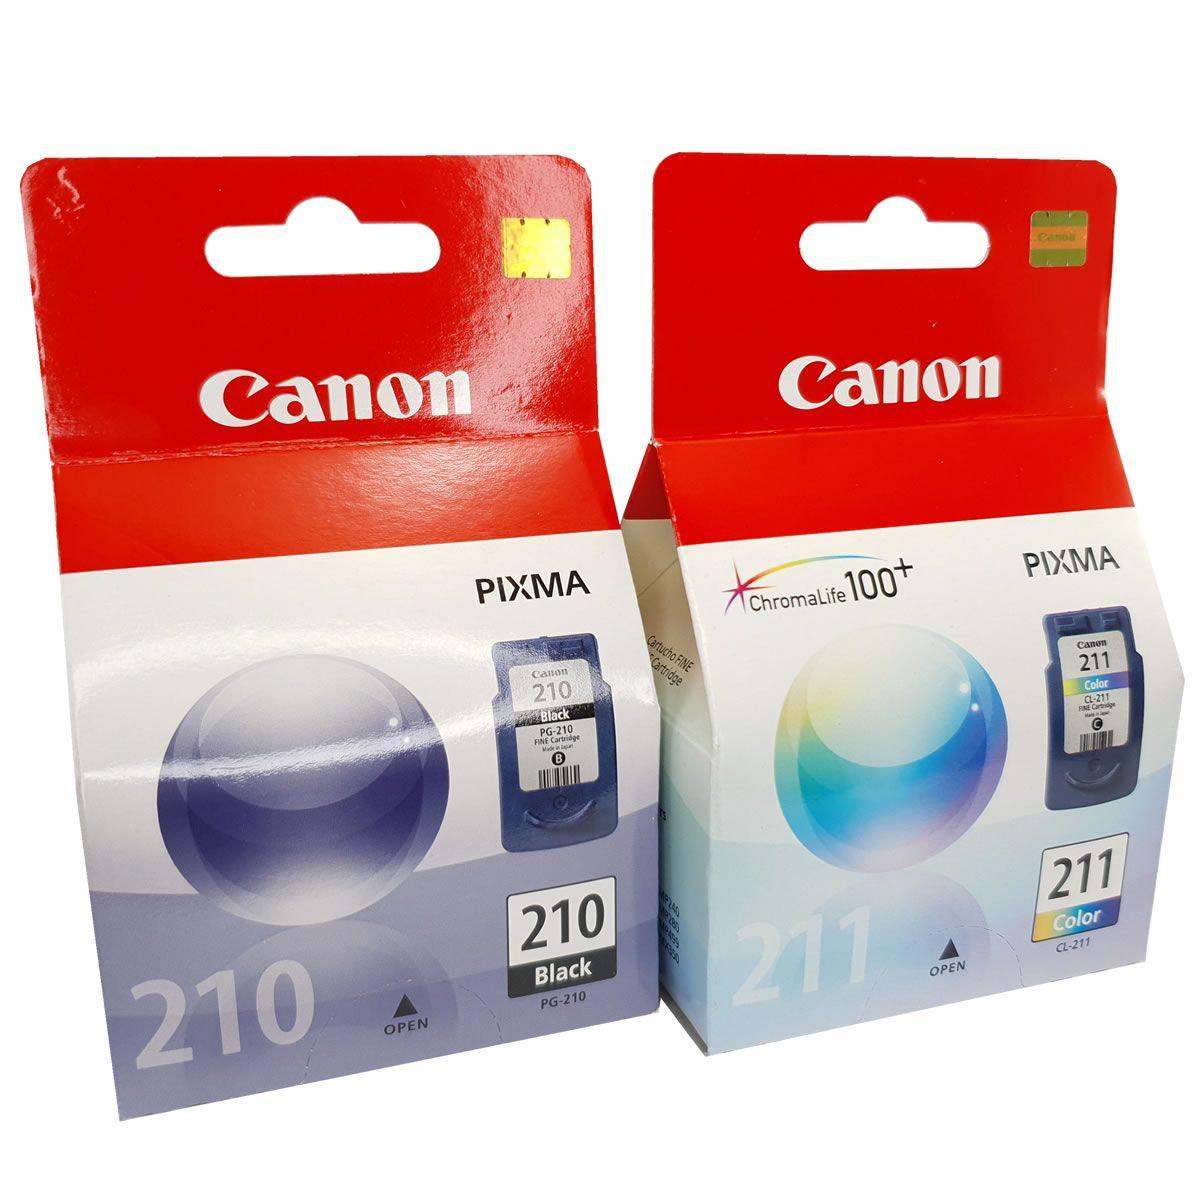 Kit 2 cartuchos Canon PG210 preto e CL211 colorido para MP240 MP250 MP260 MP490